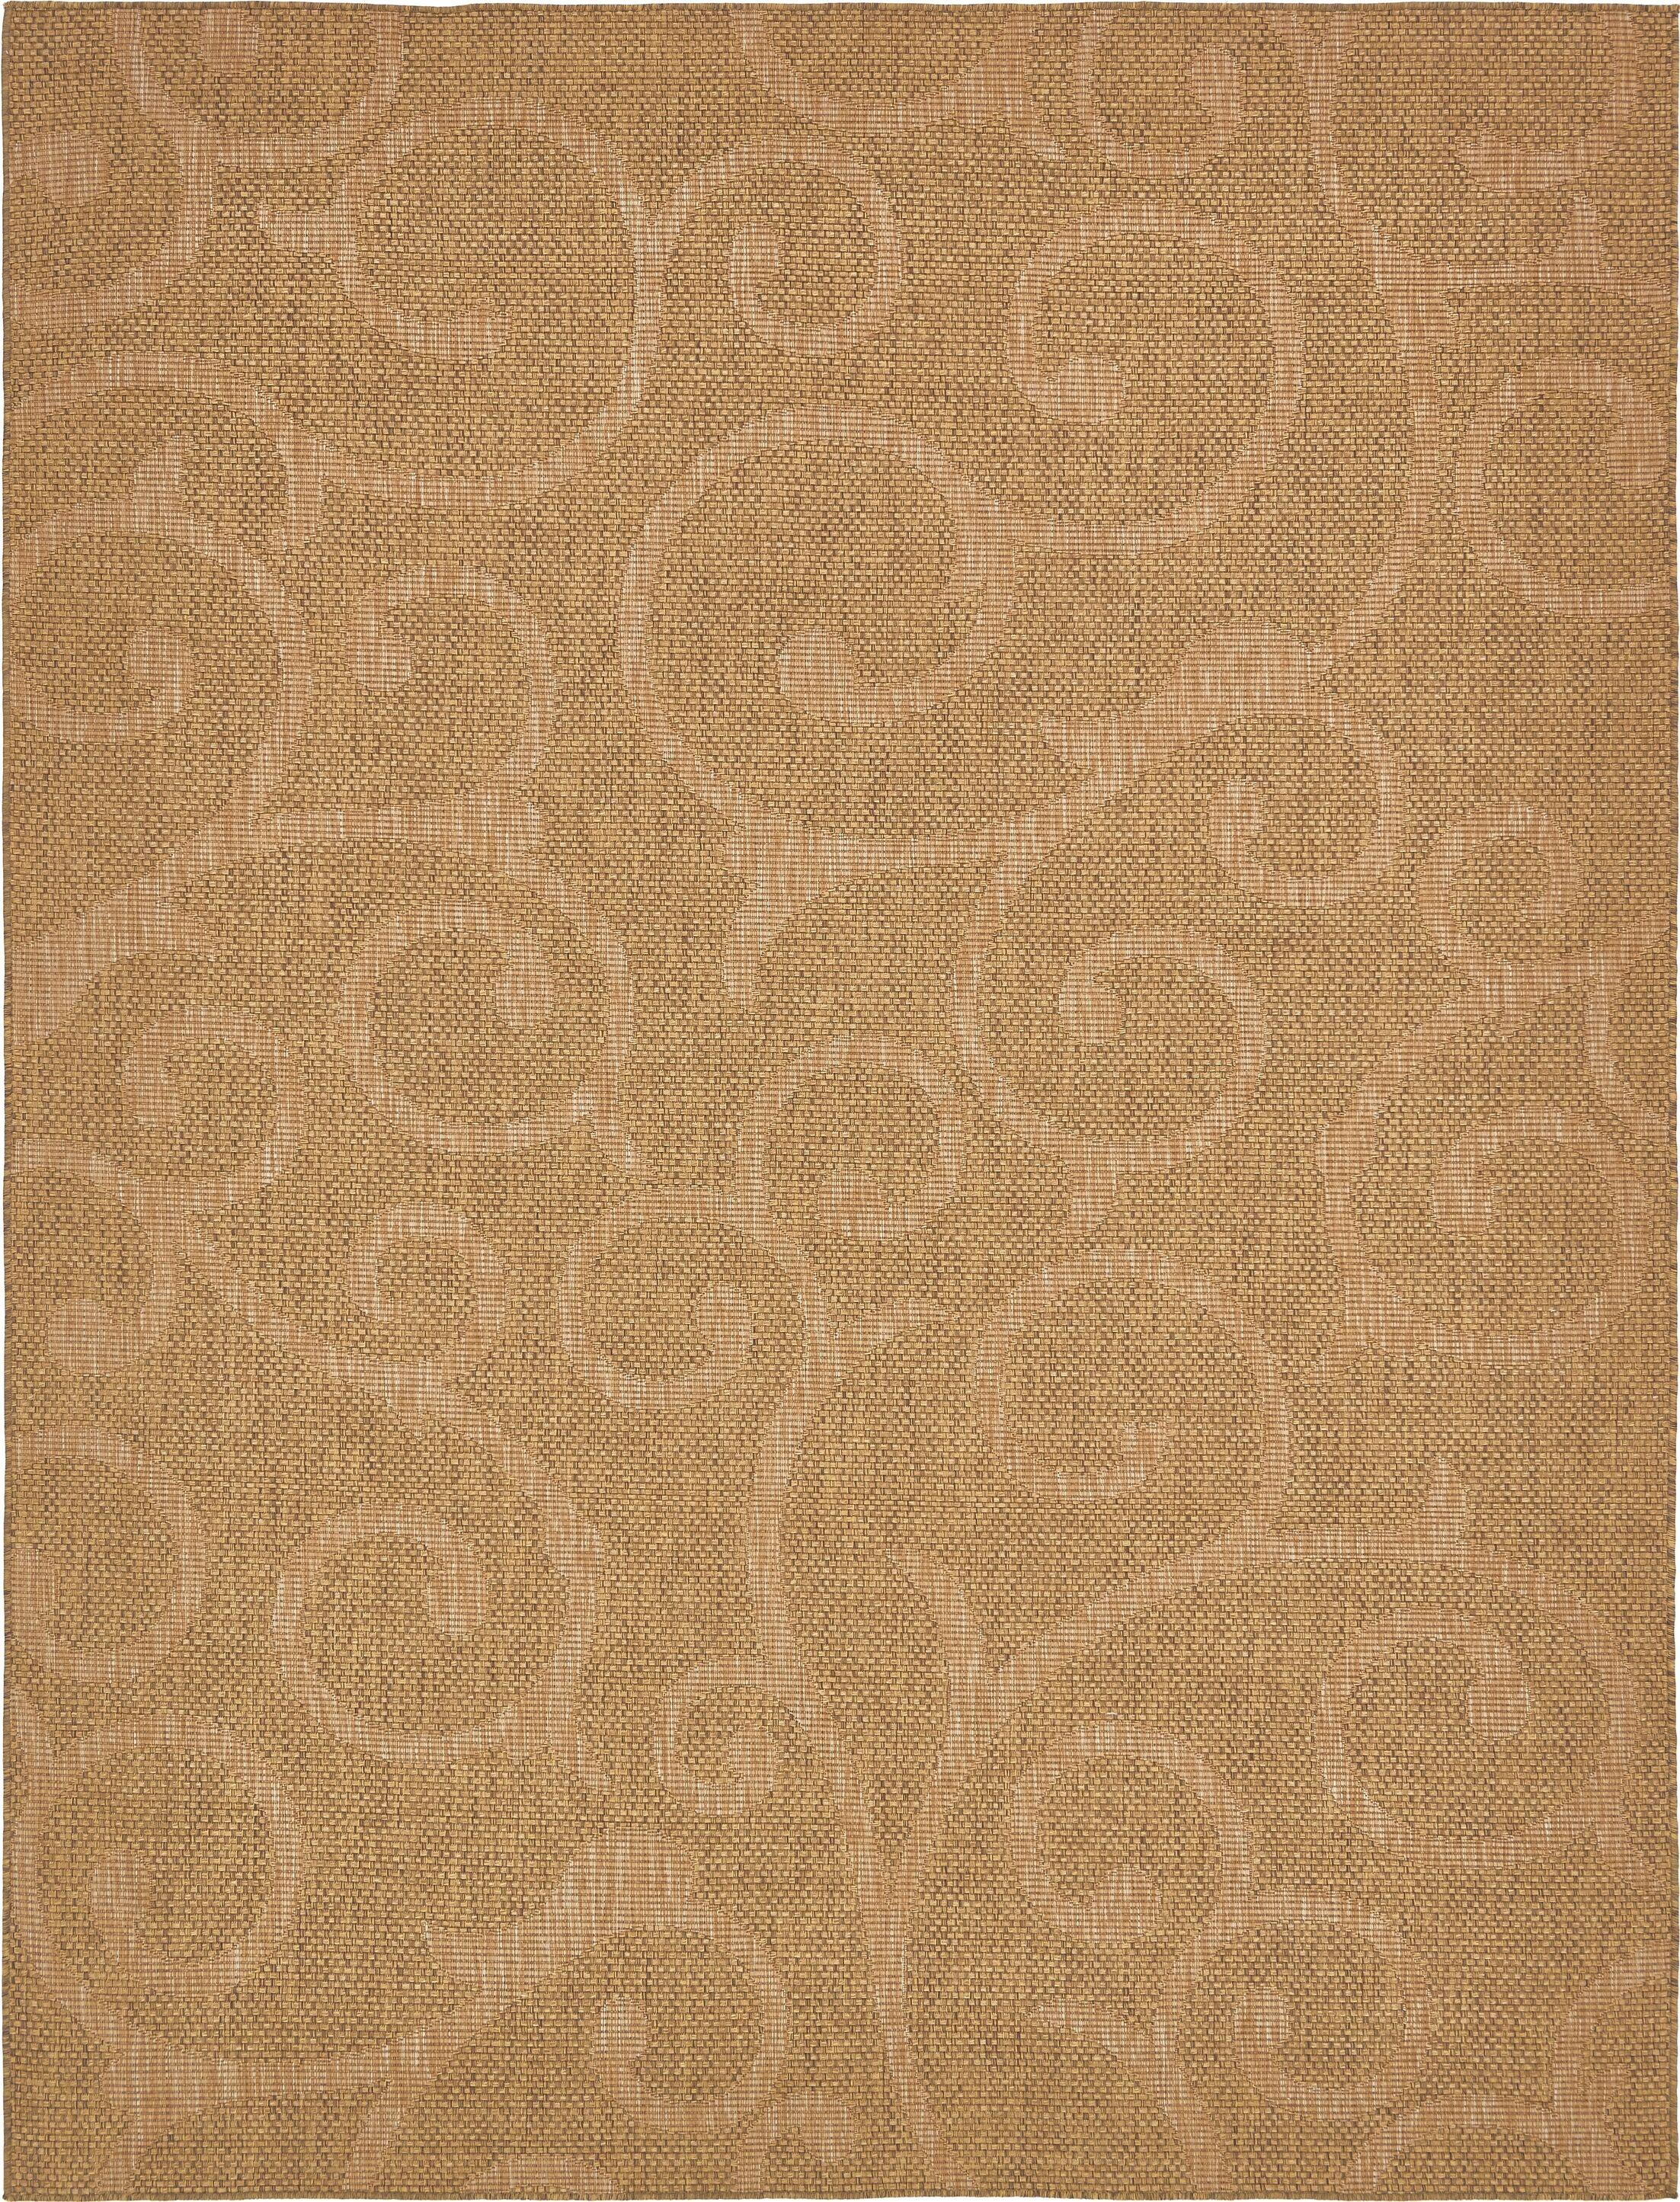 Kendari Brown Outdoor Area Rug Rug Size: Rectangle 9' x 12'